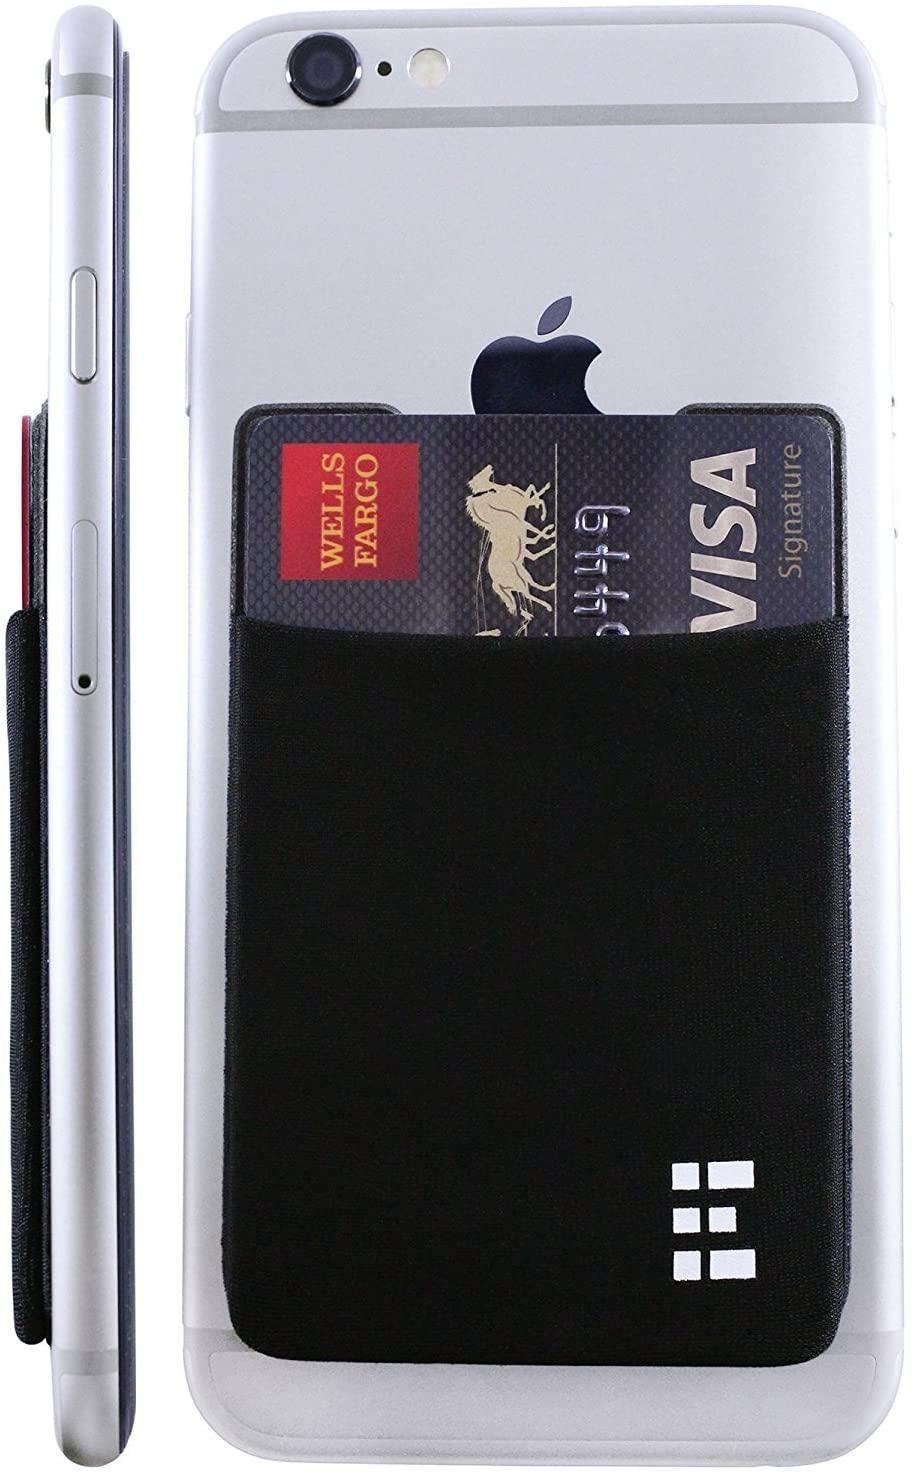 Cell Phone Credit Card Holder Stick On Wallet Case w/RFID Blocking (Midnight)